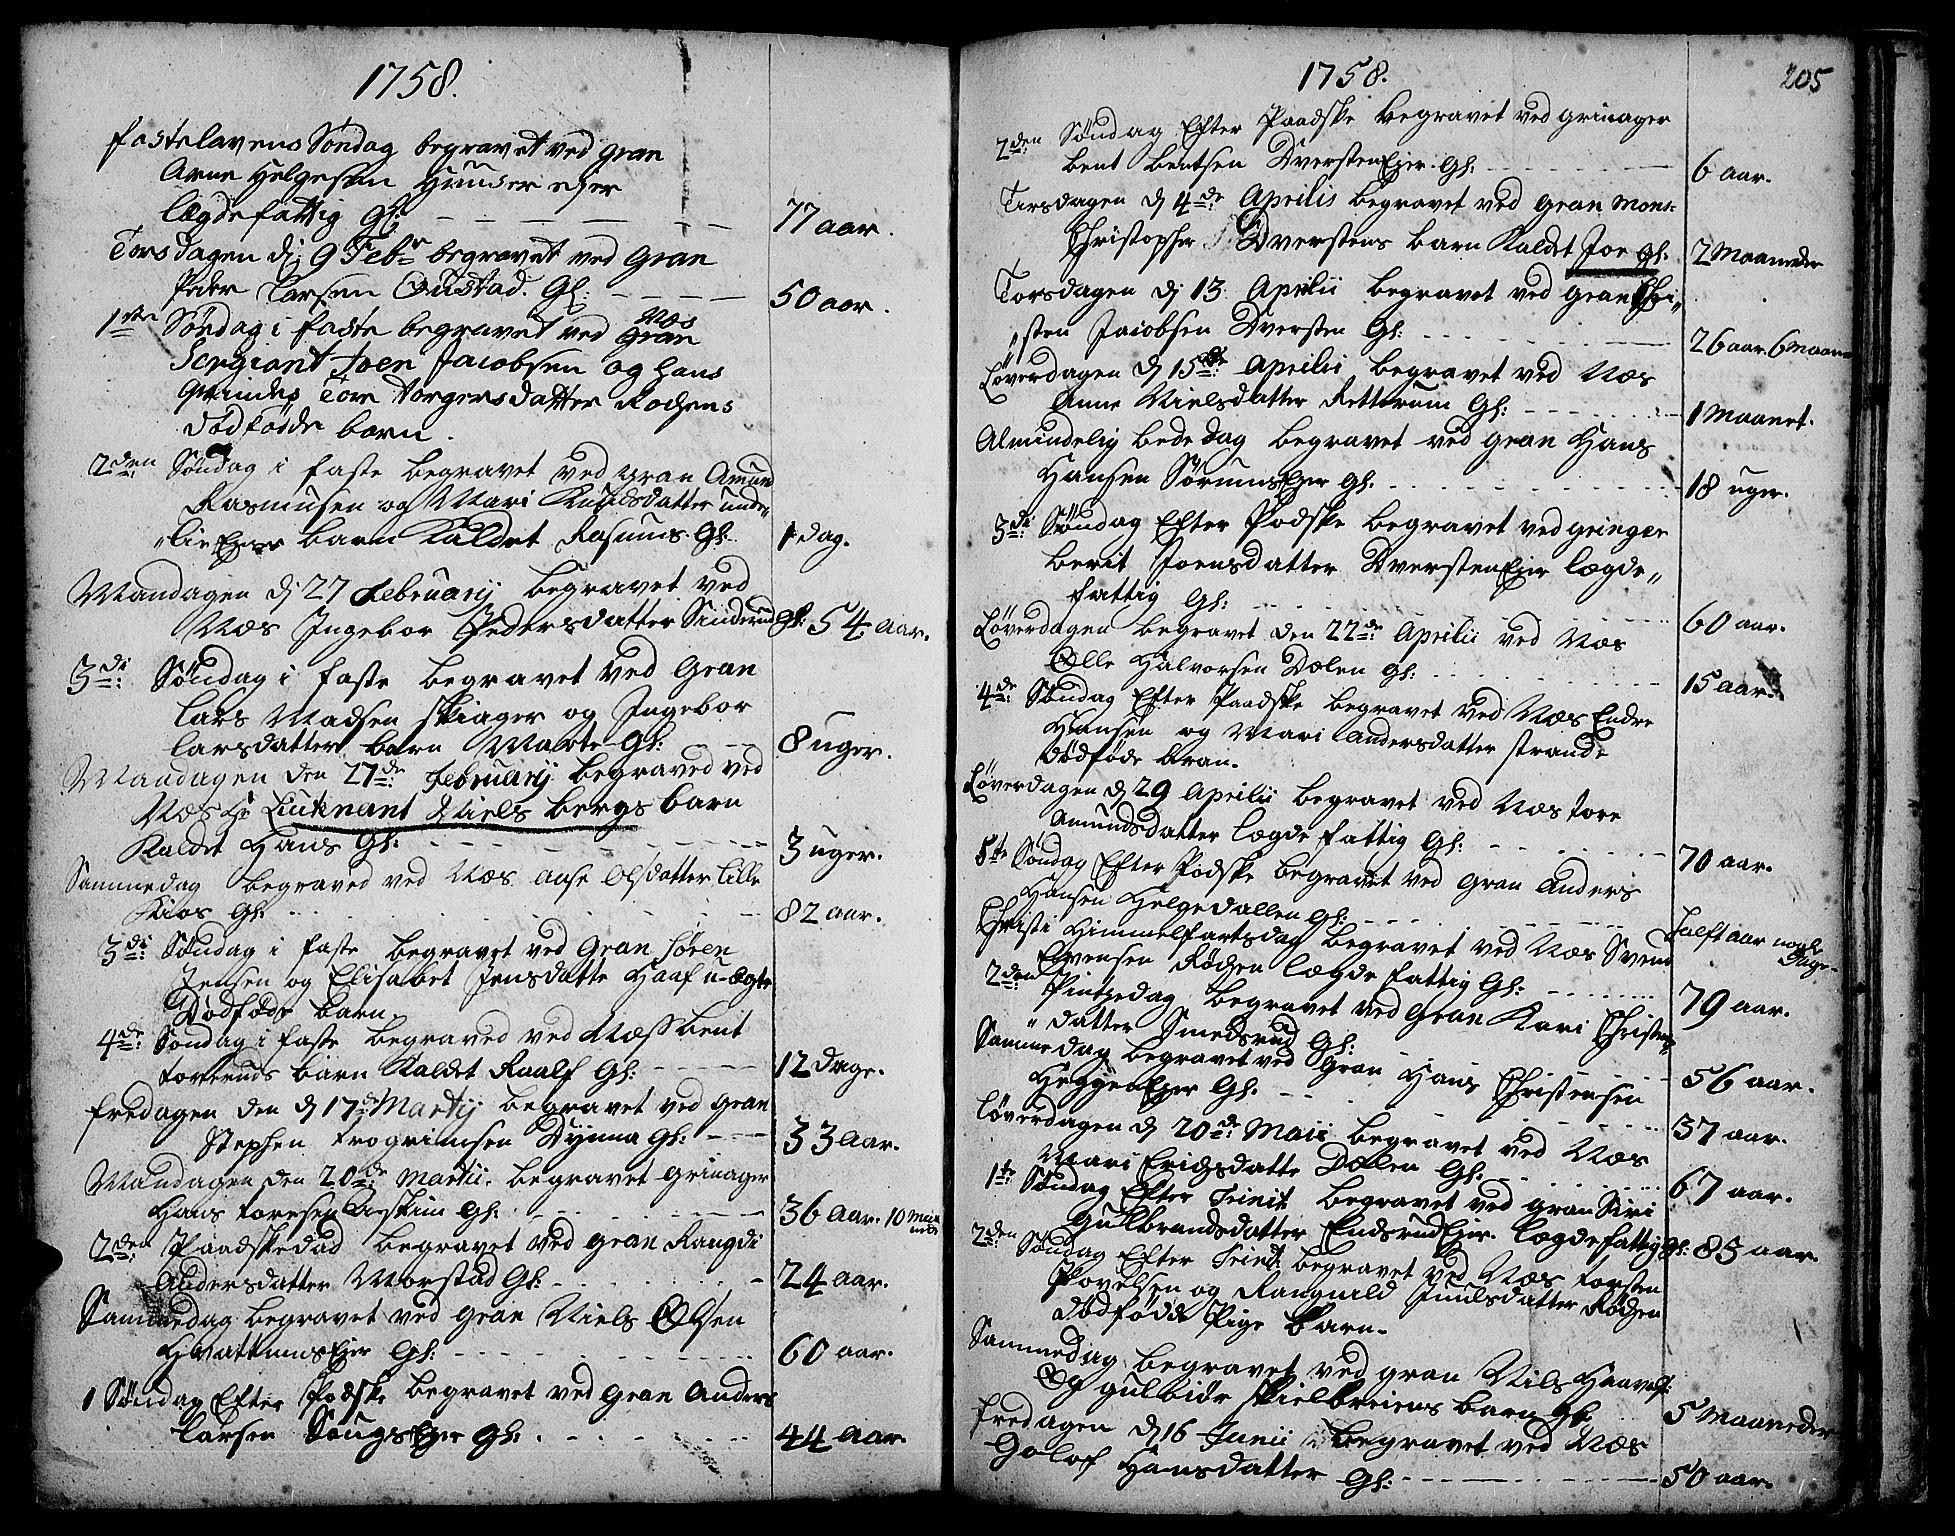 SAH, Gran prestekontor, Ministerialbok nr. 3, 1745-1758, s. 205